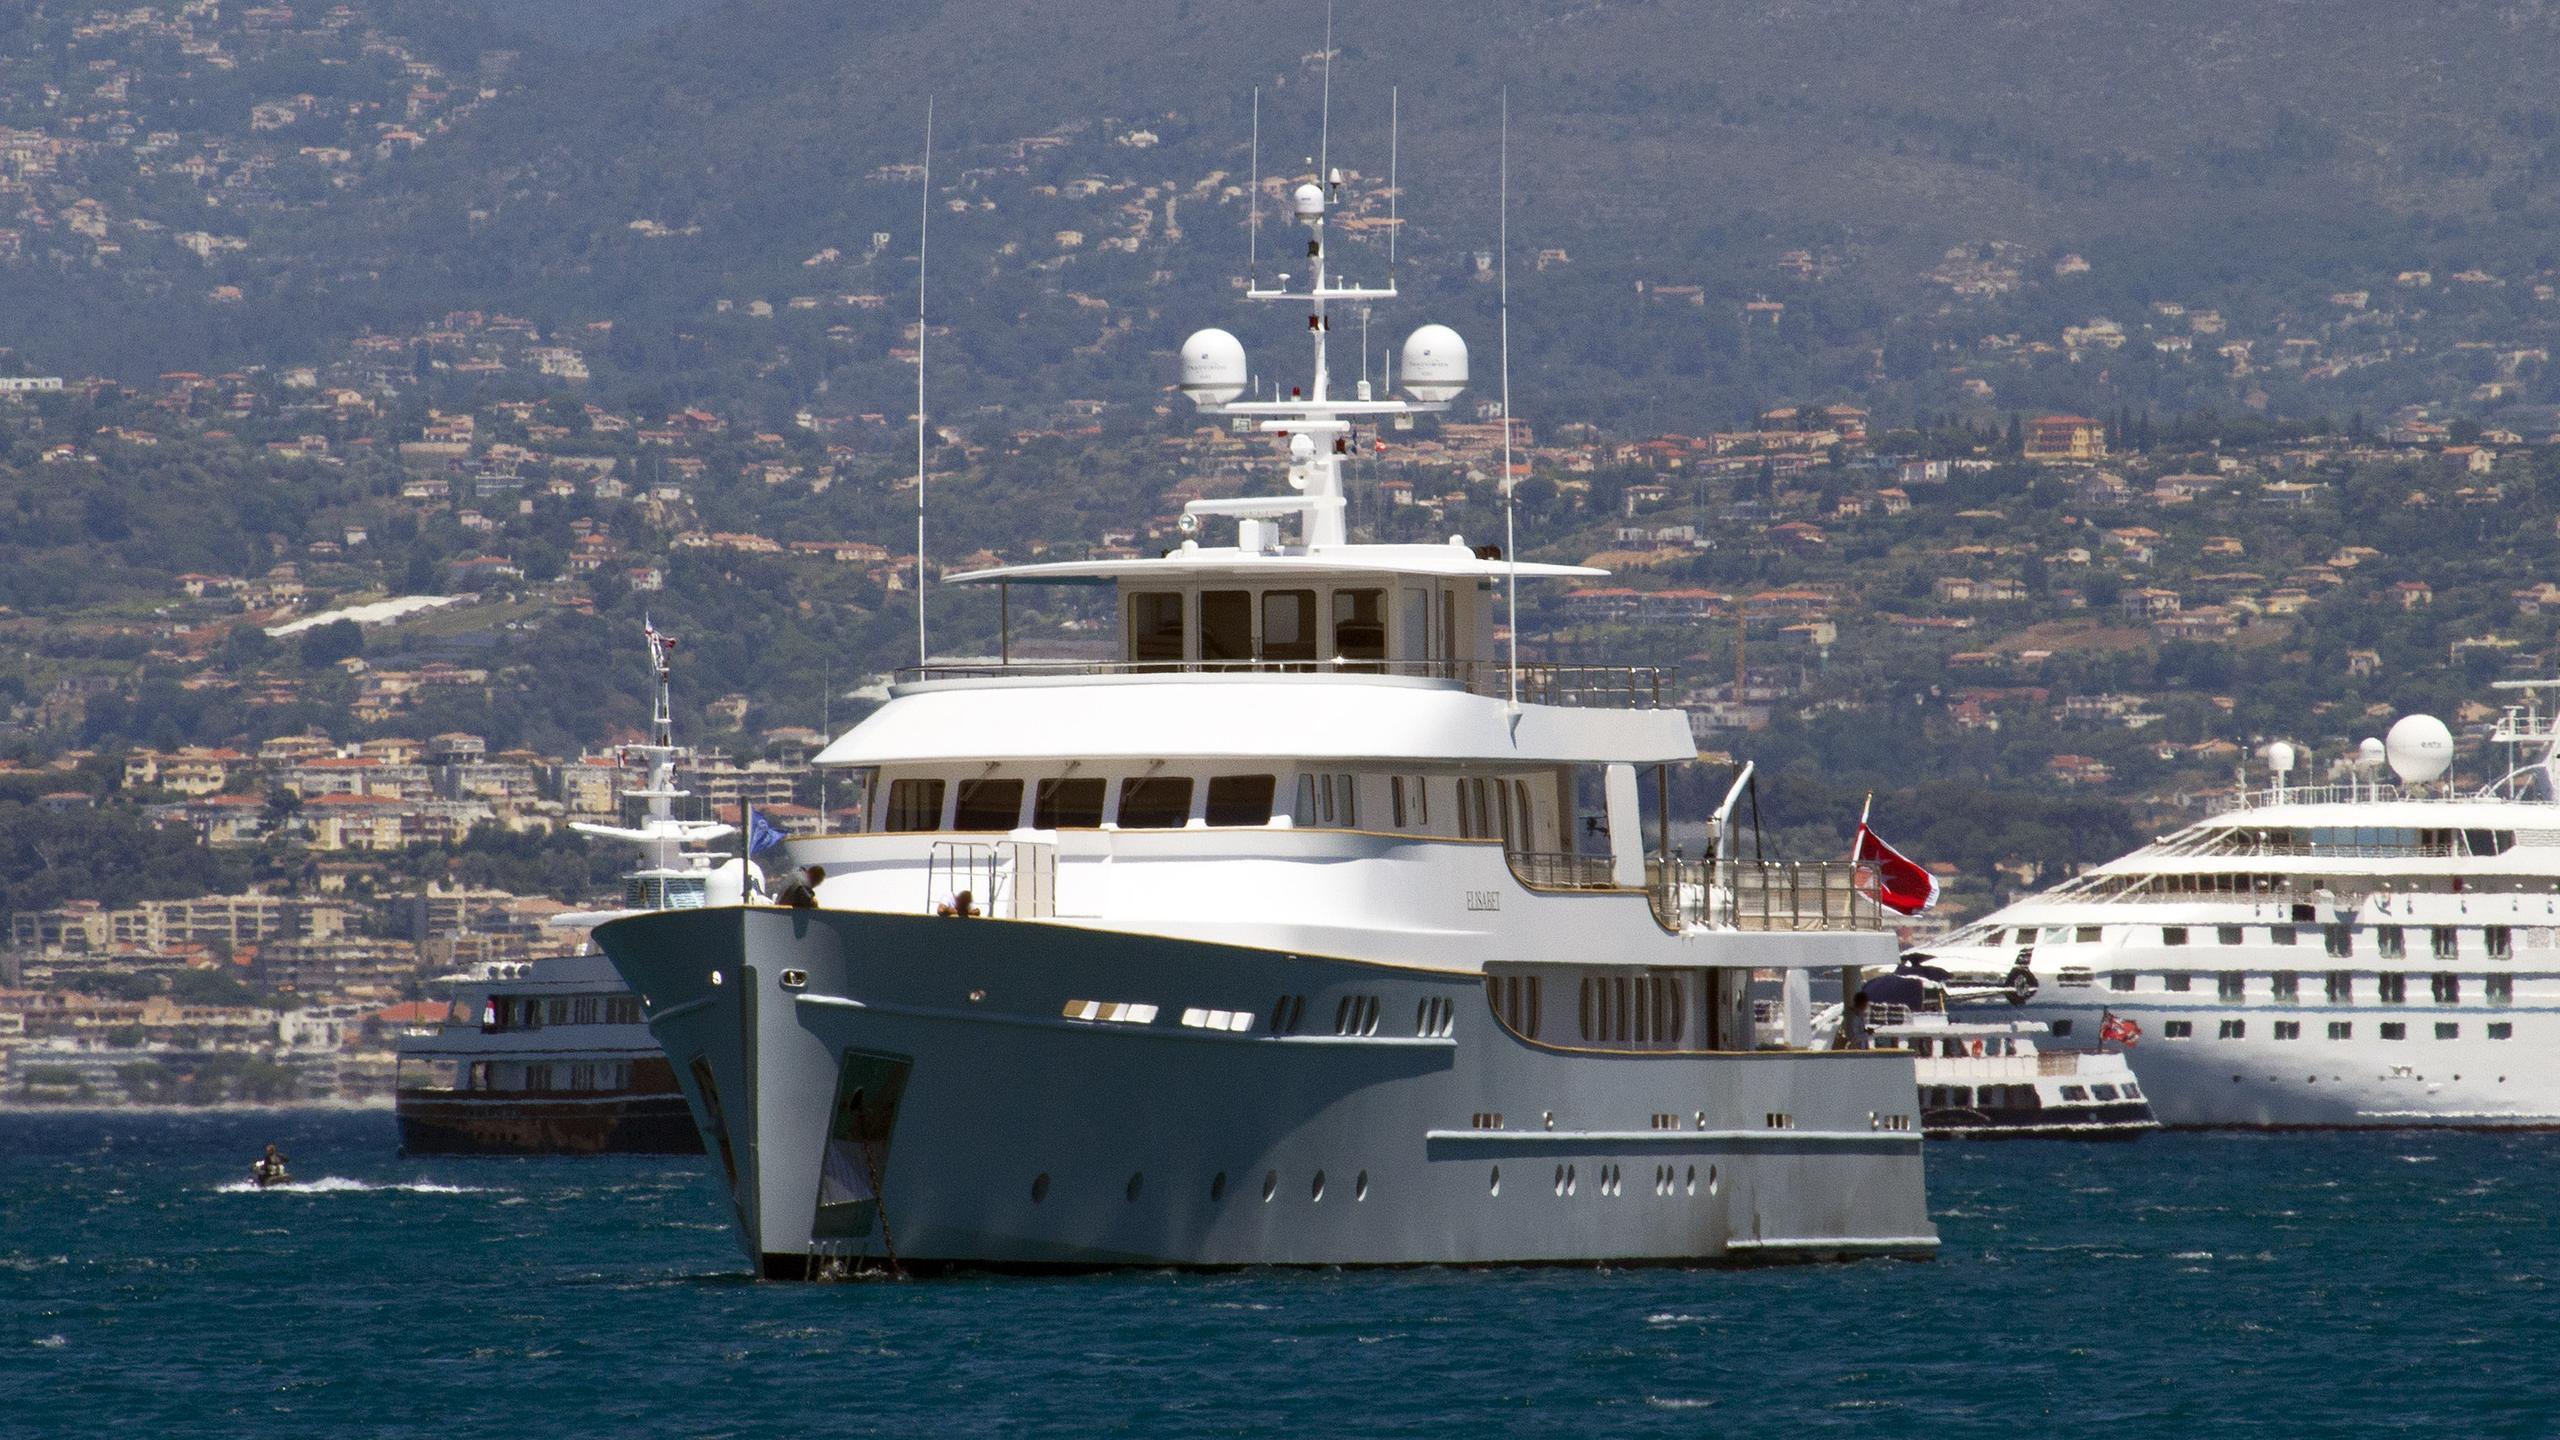 elisabet-motor-yacht-ocea-2011-47m-bow